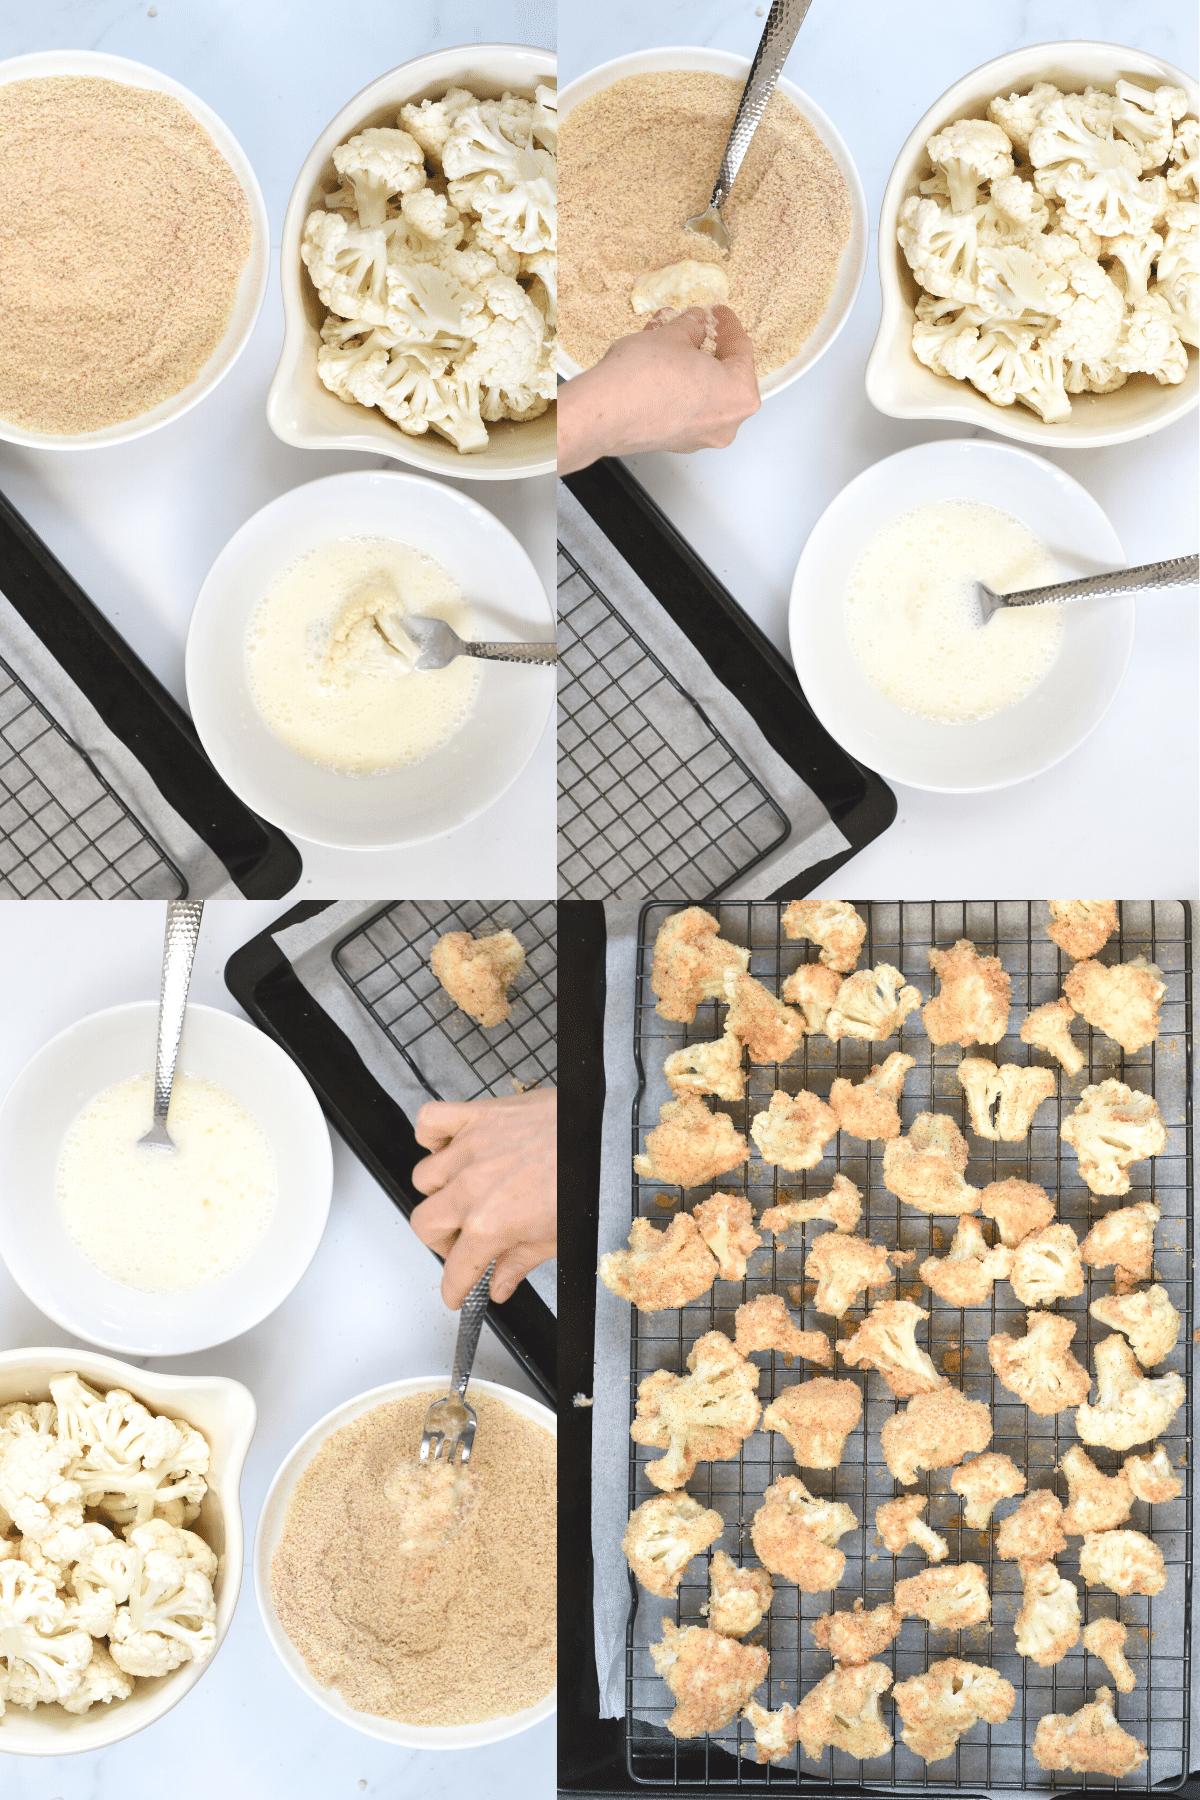 How to make Keto Buffalo Cauliflower